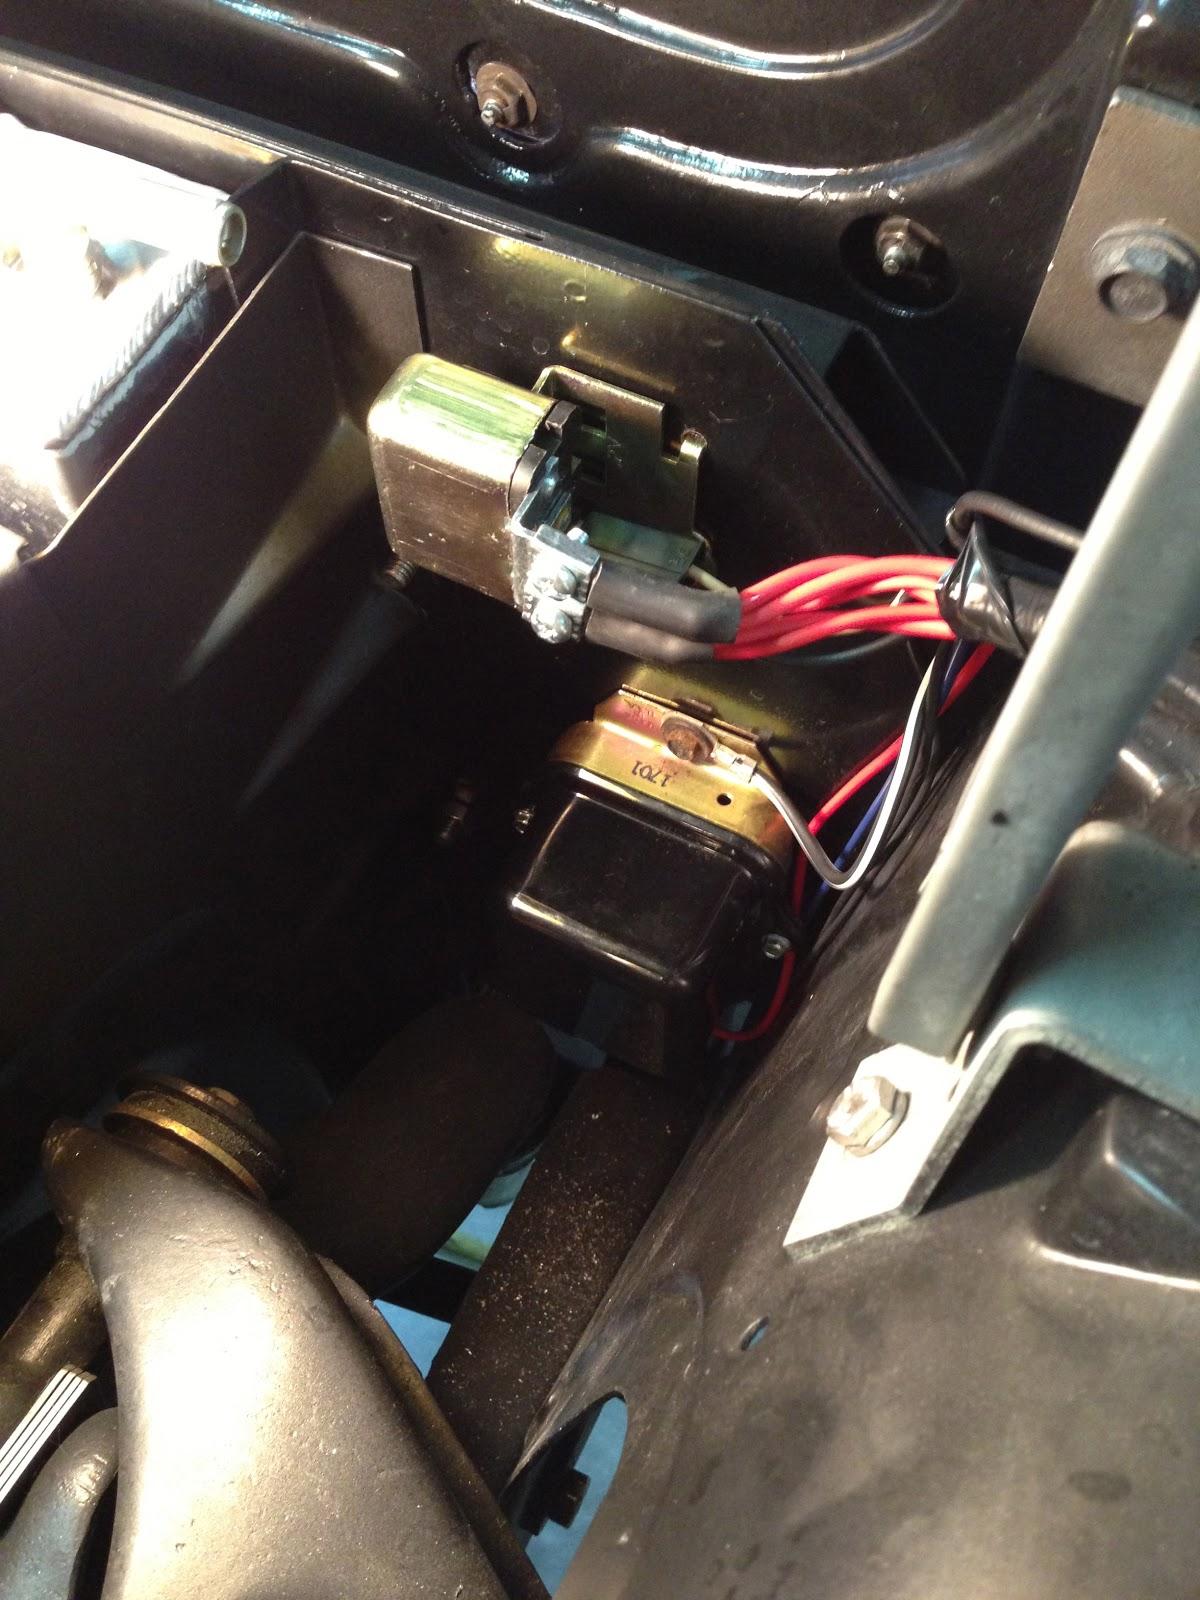 medium resolution of 1963 corvette sting ray split window coupe restoration on the key voltage regulator adjustment 63 corvette 63 corvette voltage regulator wiring diagram